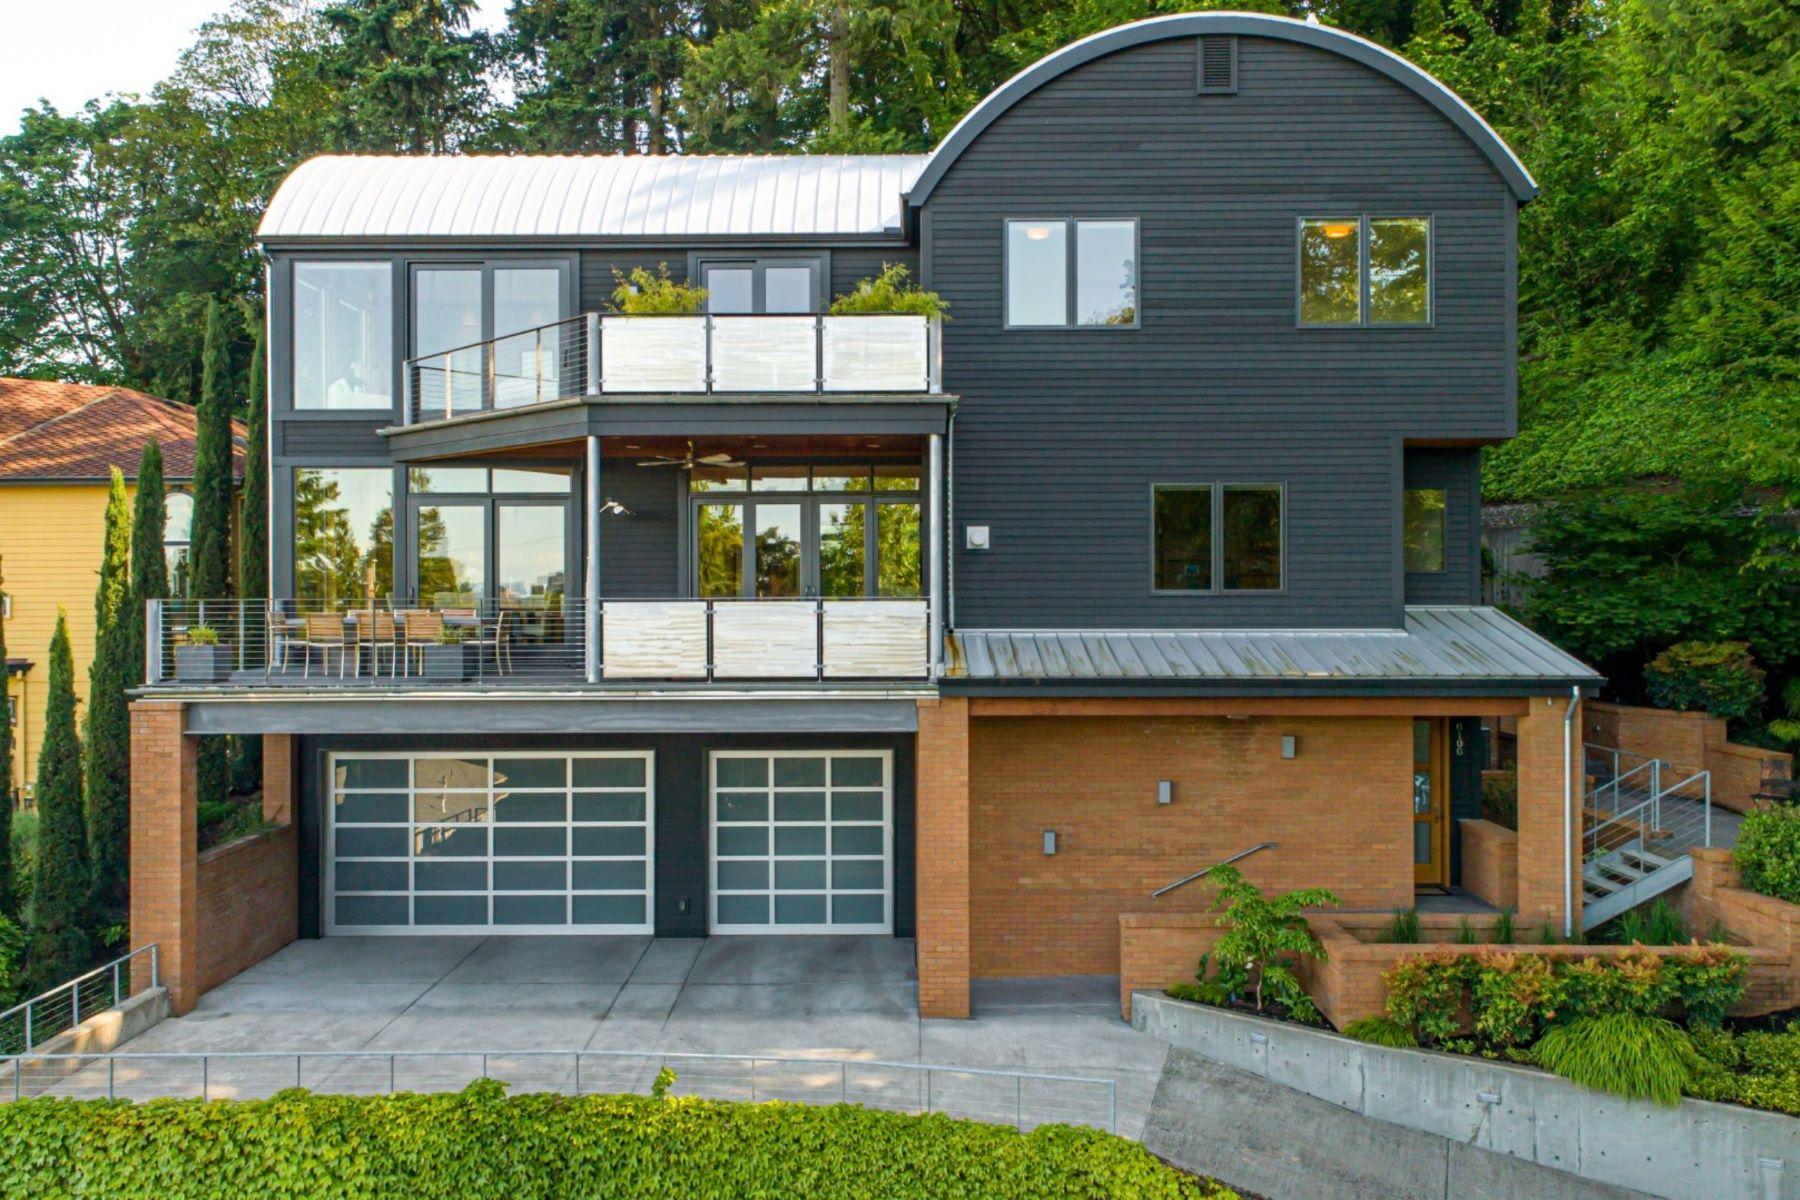 Other Residential Homes για την Πώληση στο 100 SW VERMONT ST Portland, OR 97219 100 Vermont St, Portland, Ορεγκον 97219 Ηνωμένες Πολιτείες